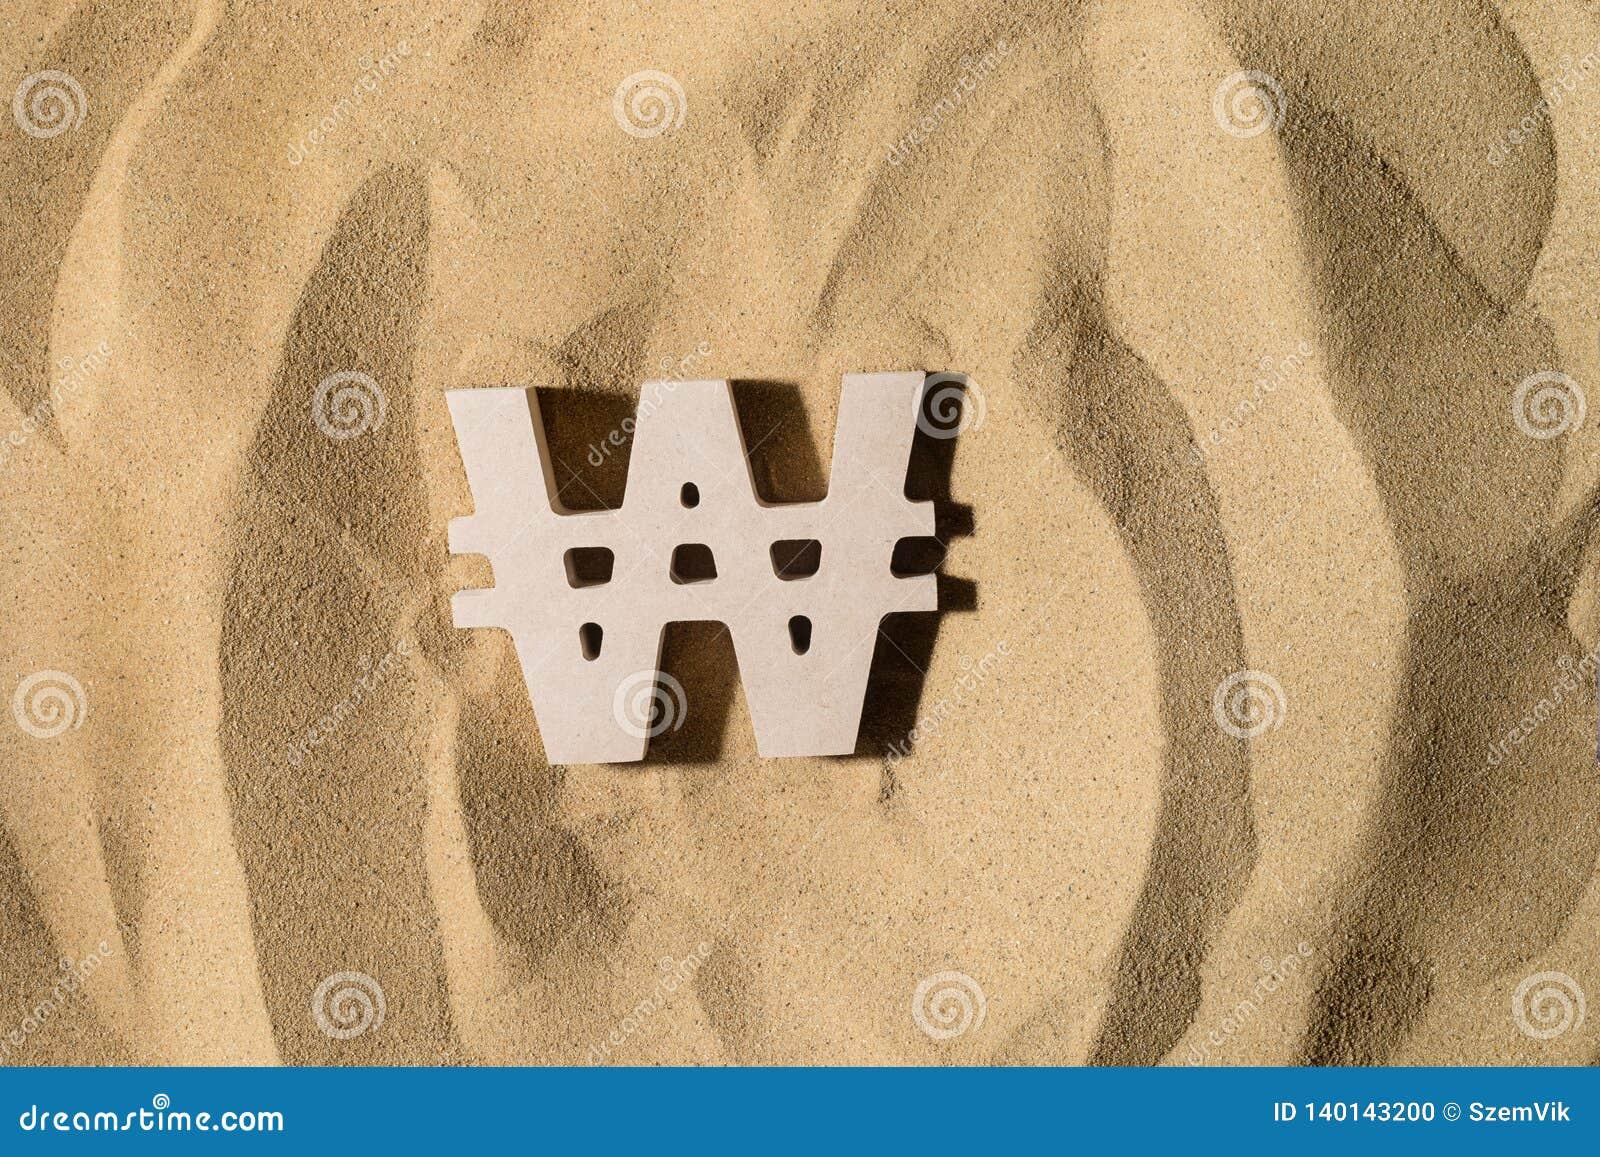 Won Sign On the Sand